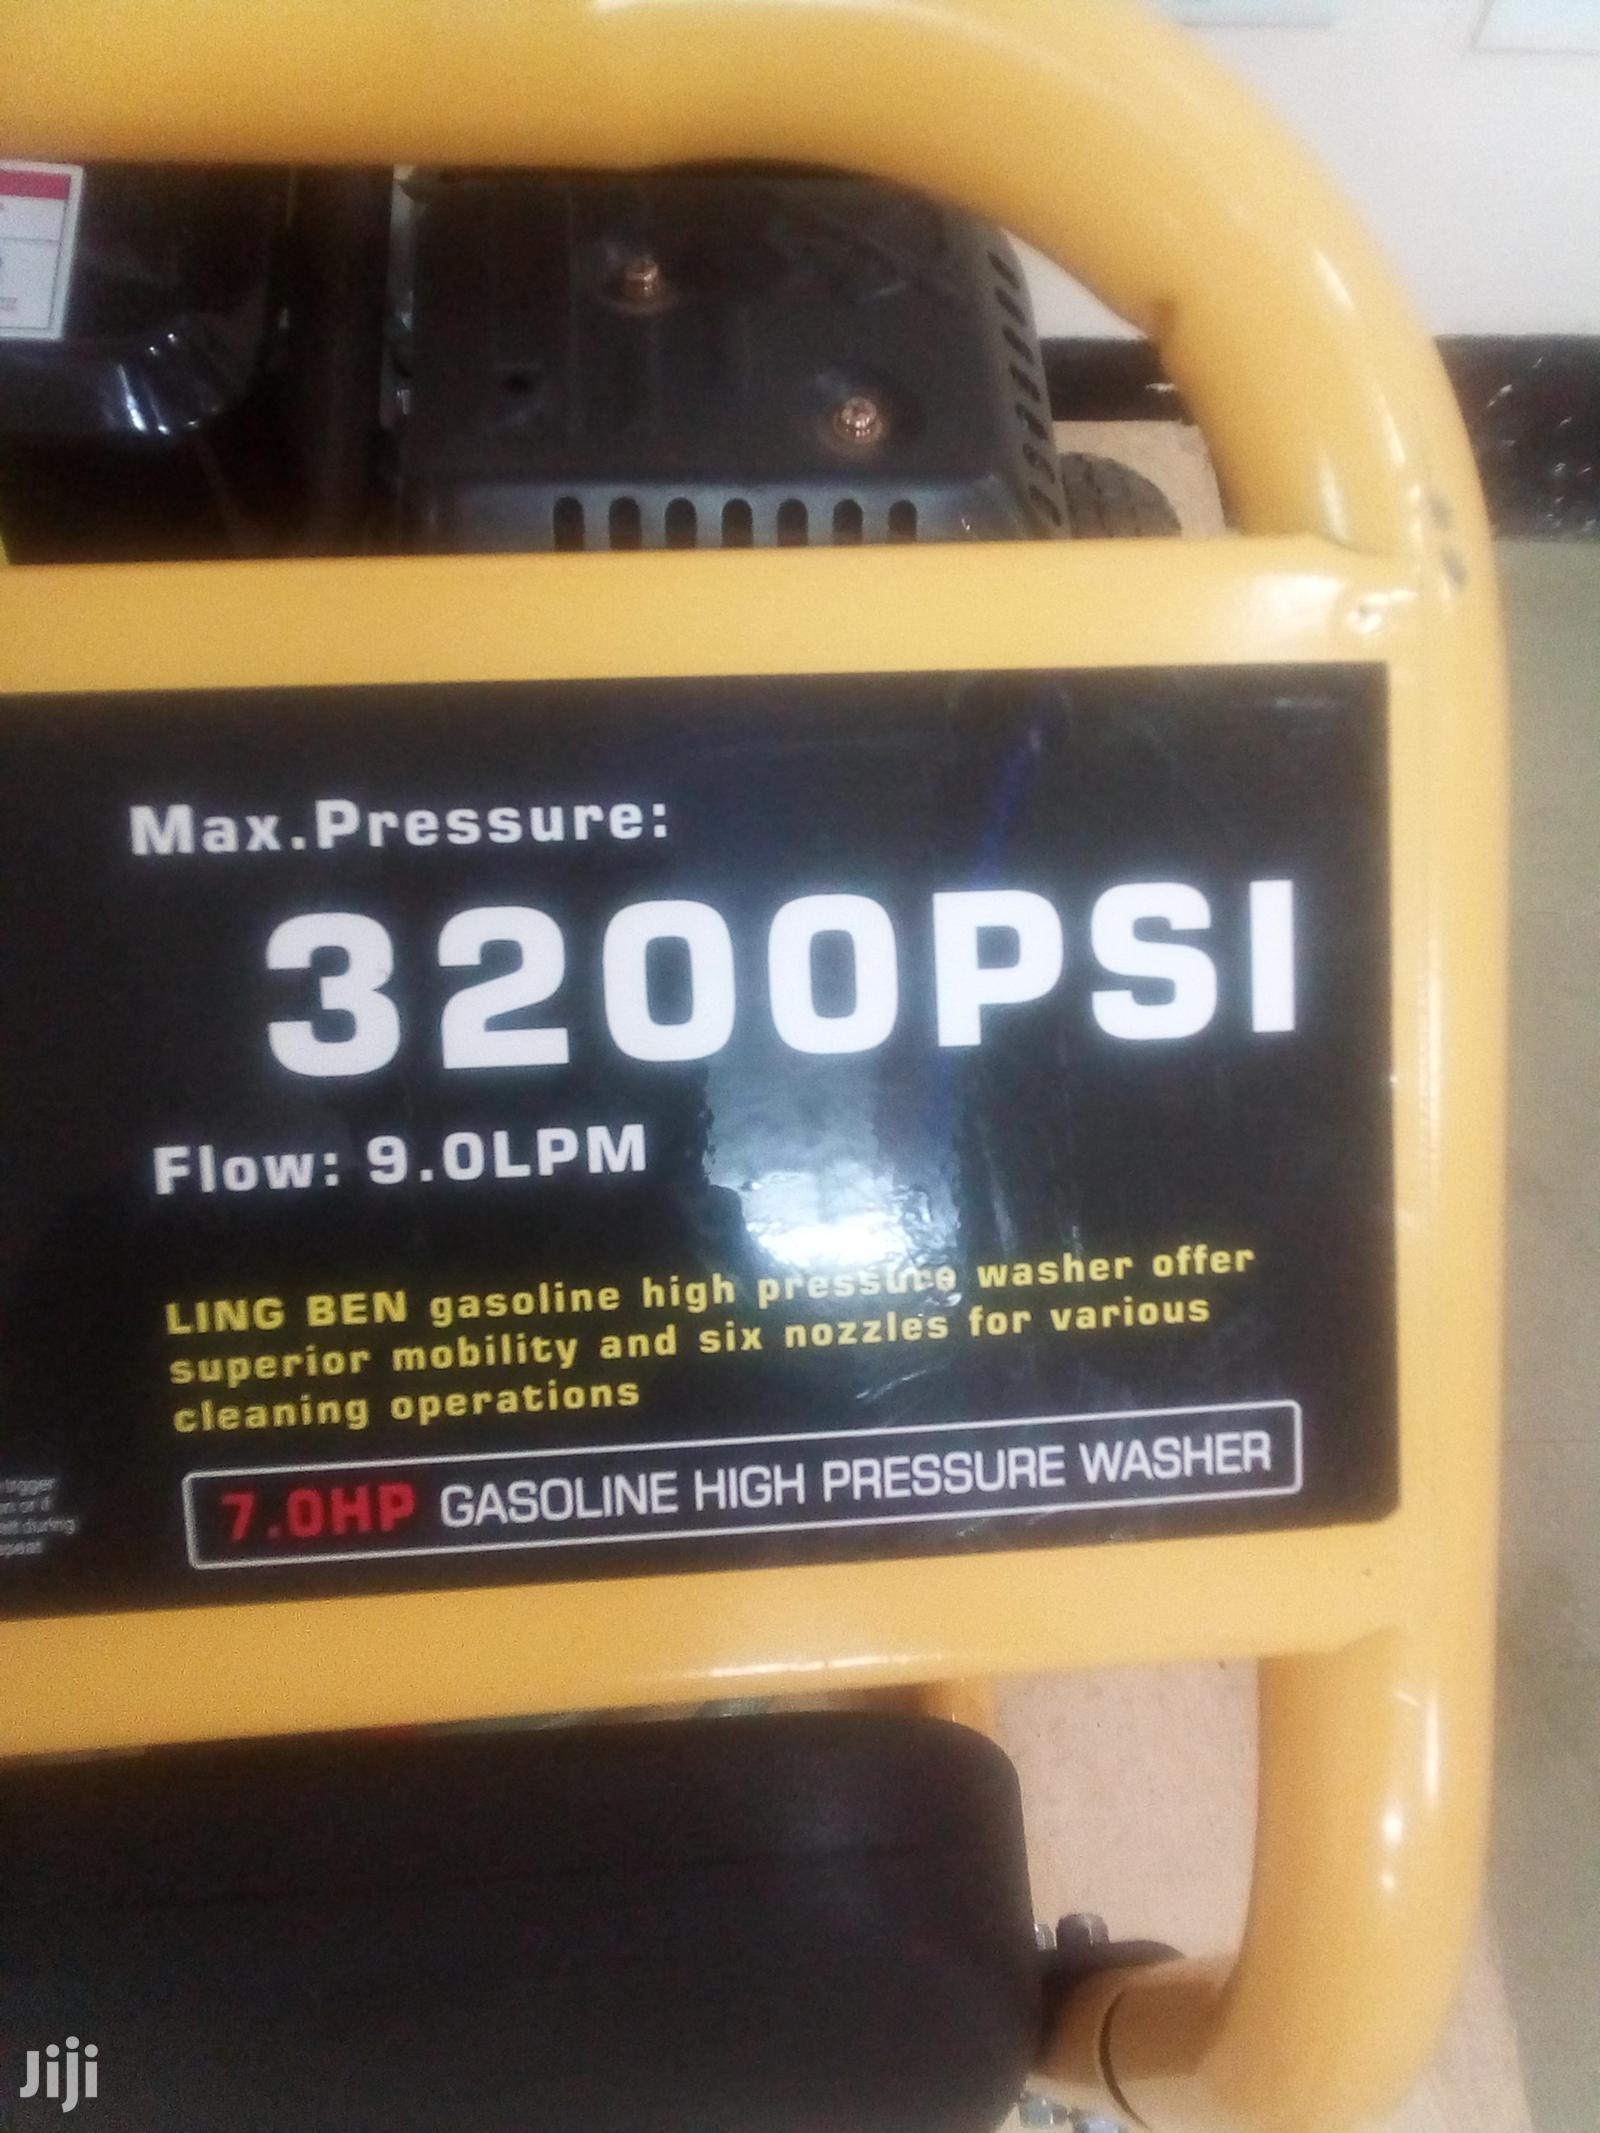 Brand New 3200psi Carwash Machine. | Vehicle Parts & Accessories for sale in Embakasi, Nairobi, Kenya